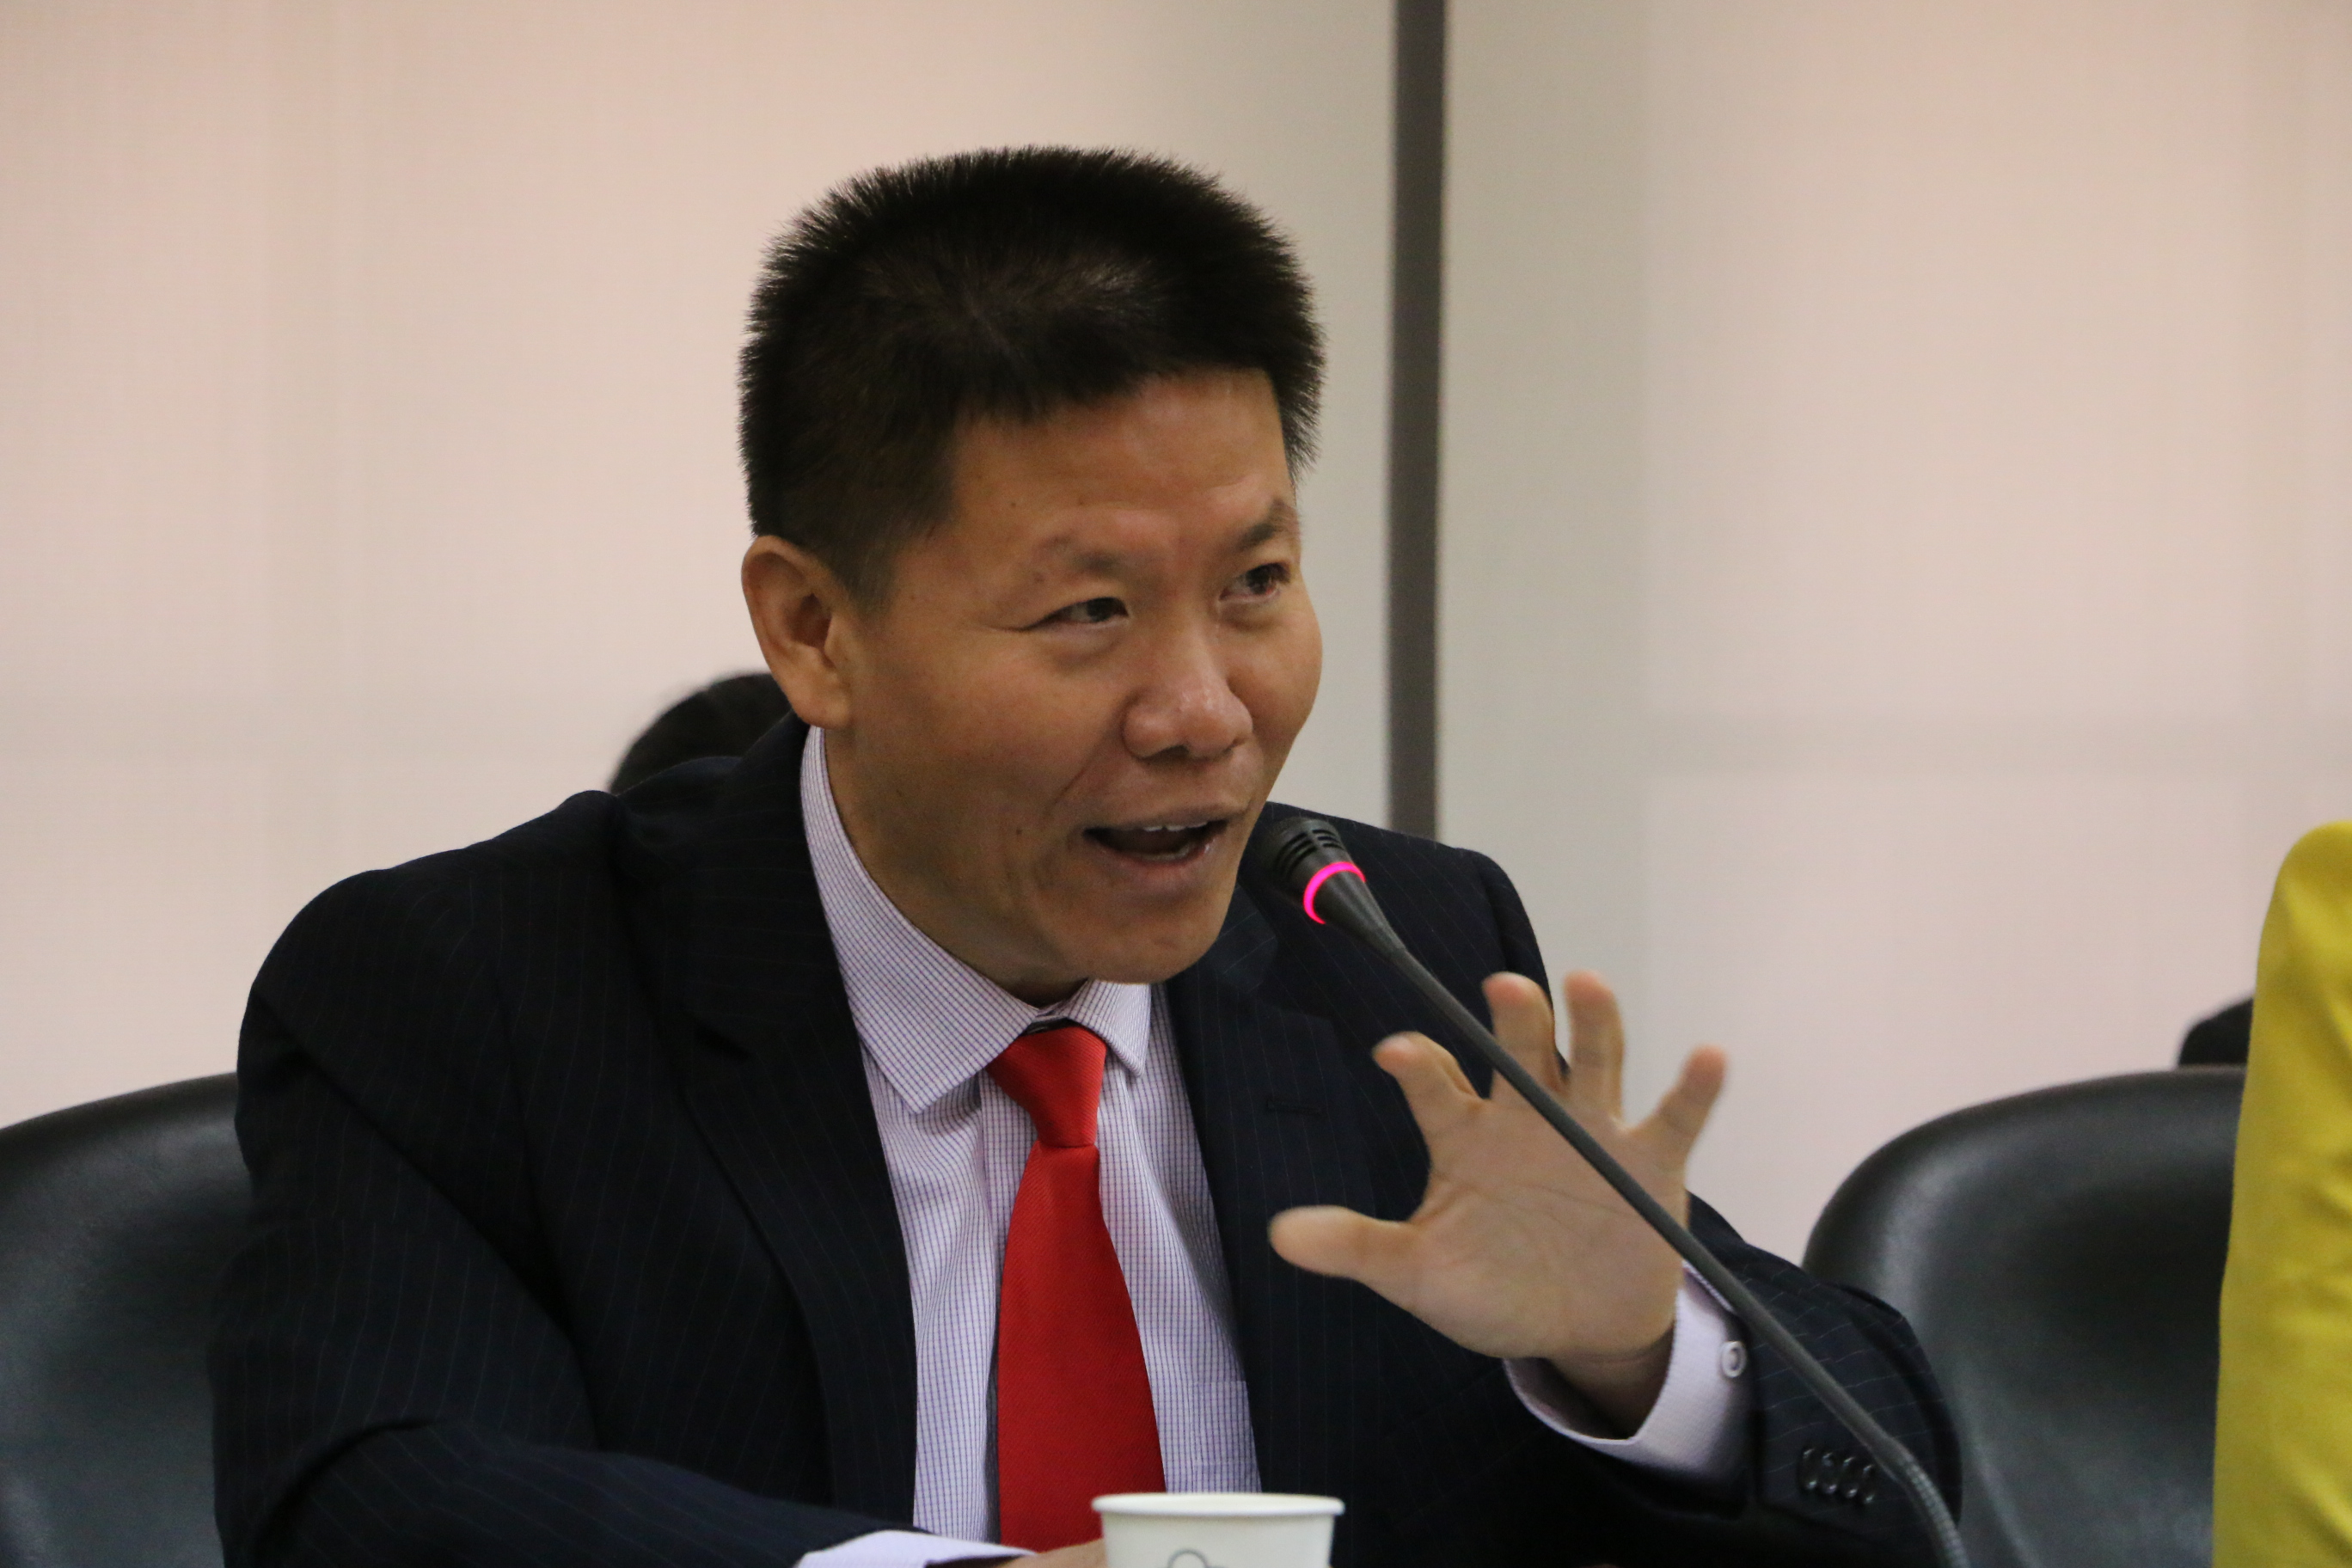 Bob Fu